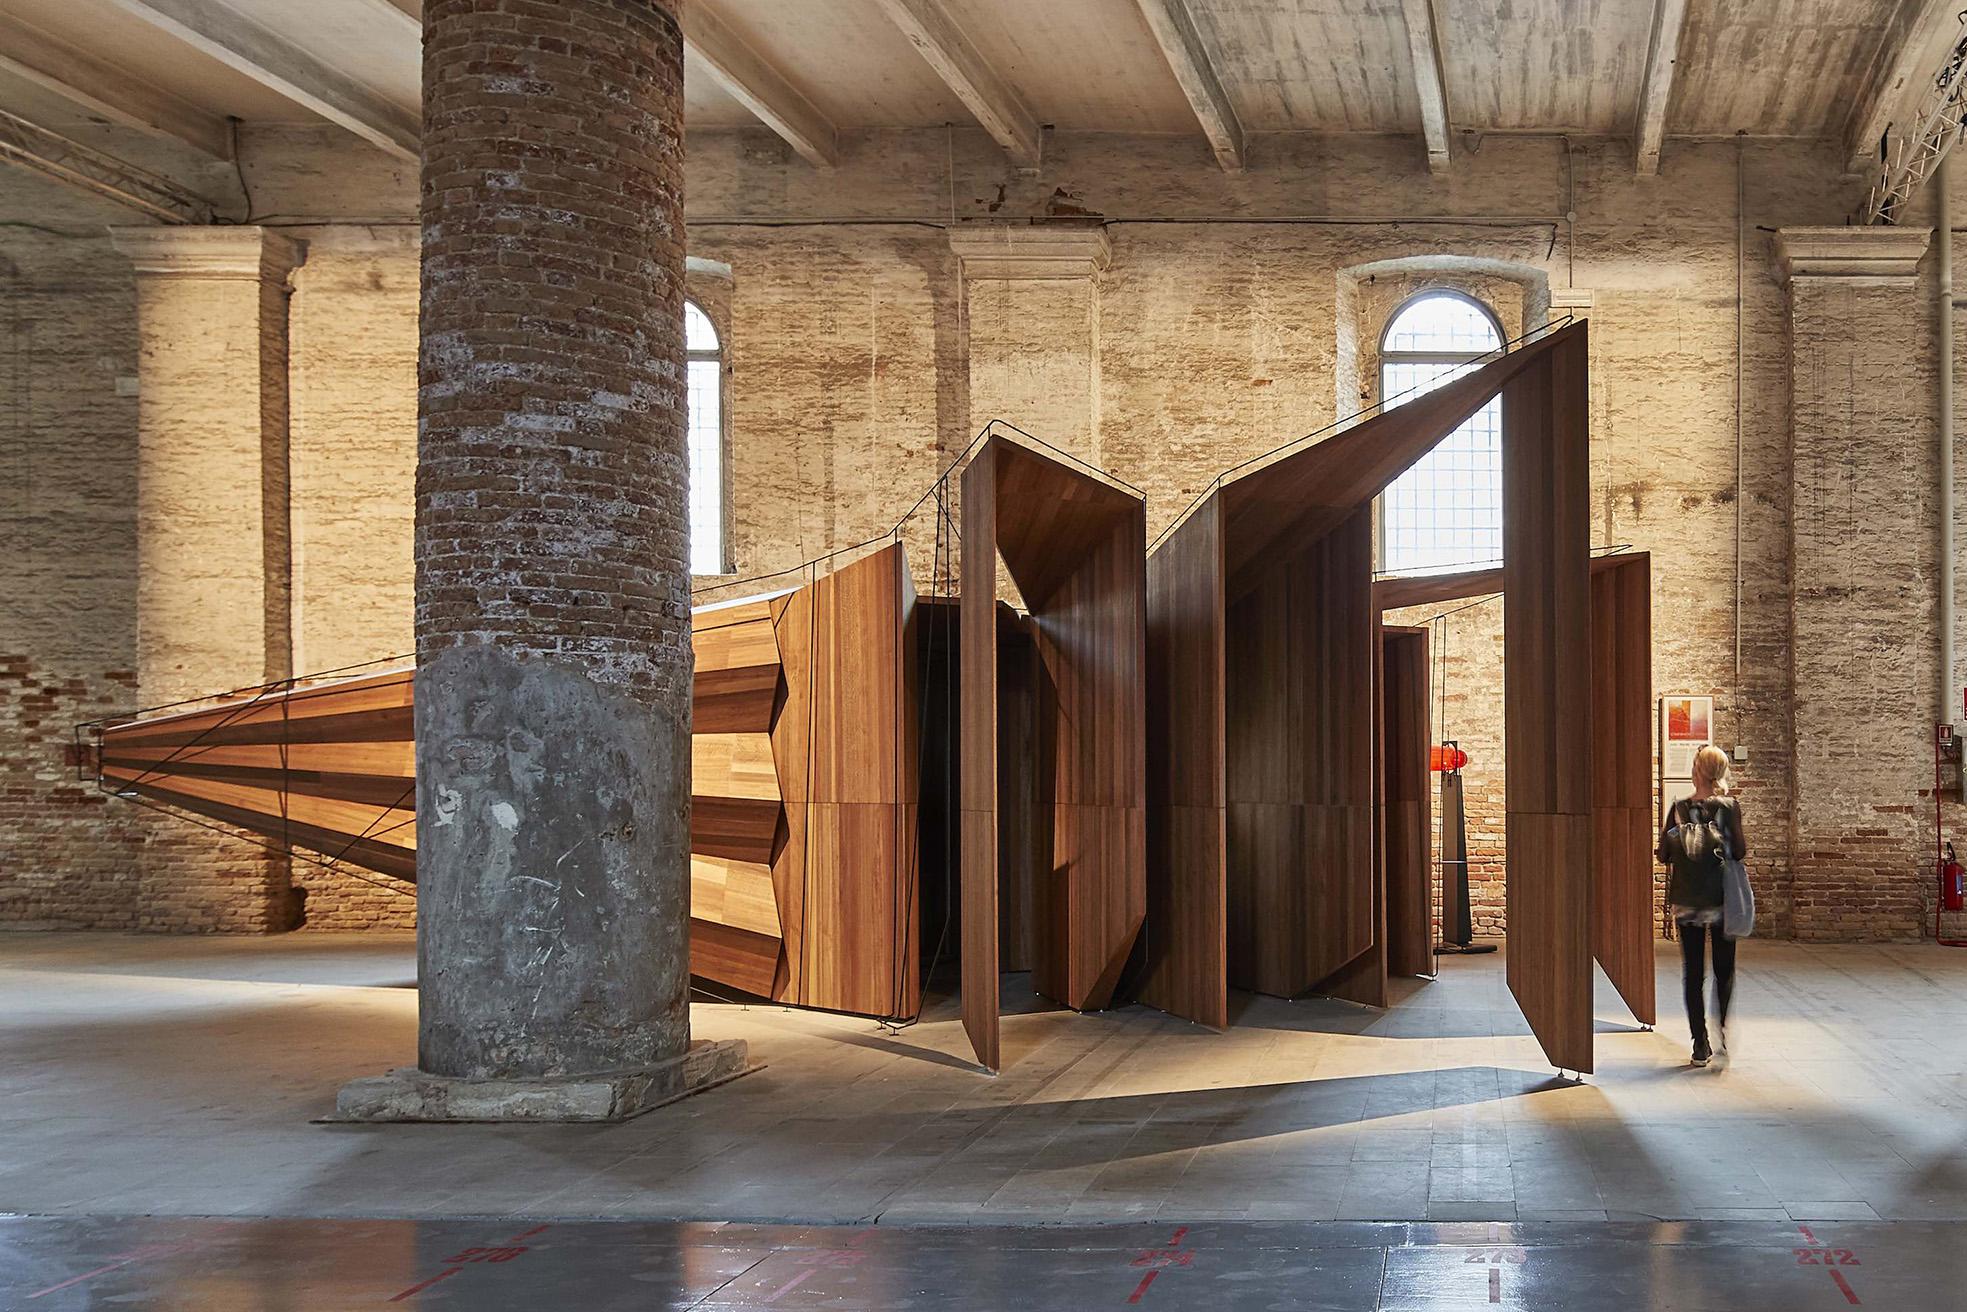 John Wardle Transports Visitors At The Venice Biennale